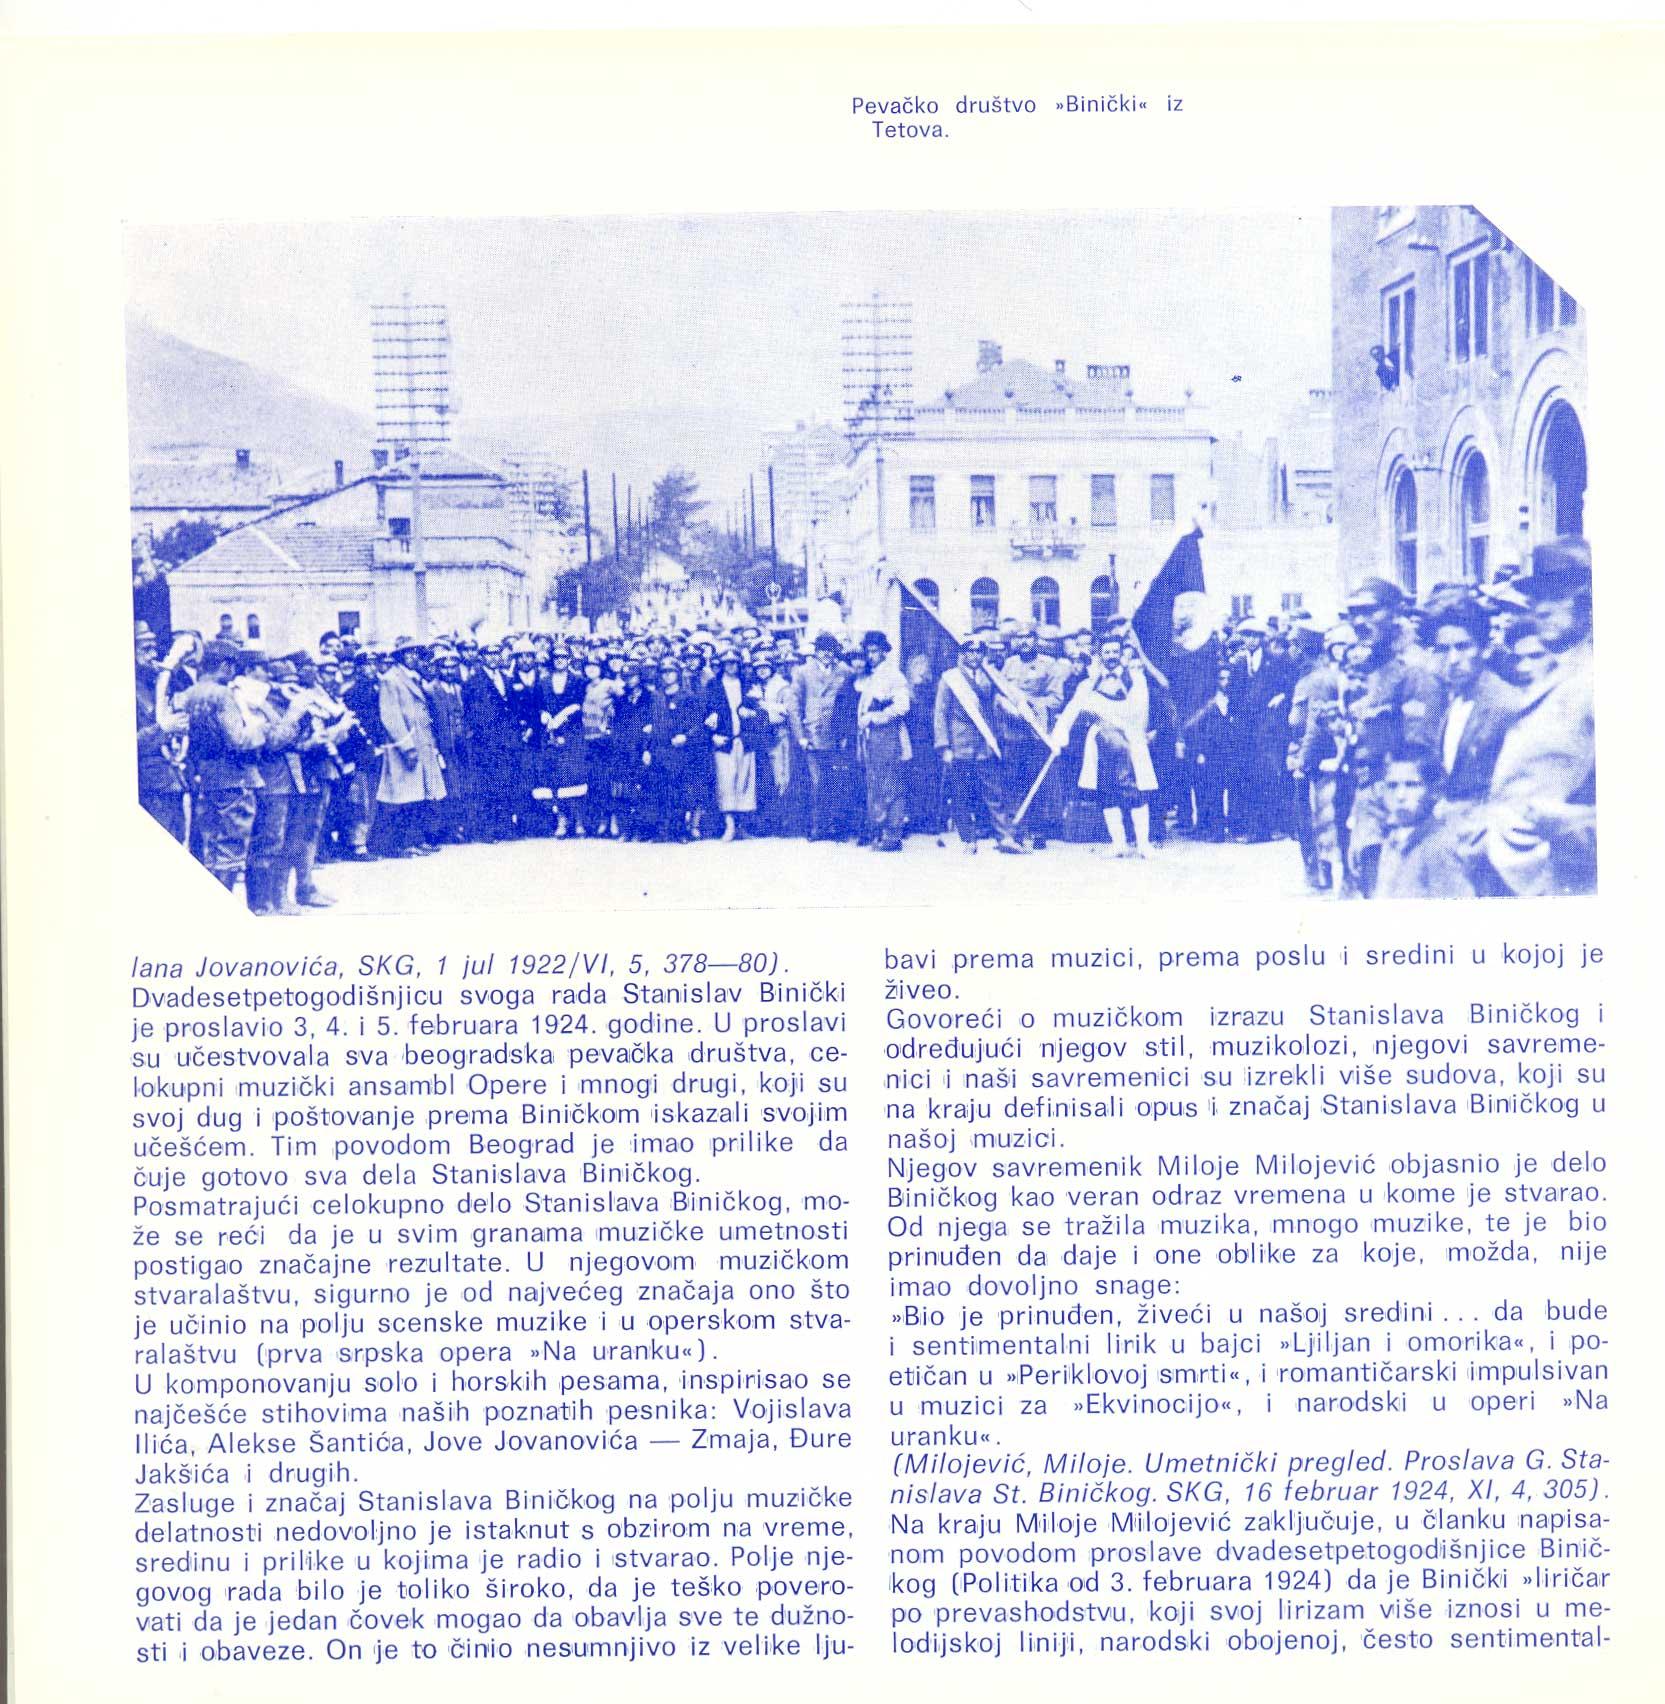 stanislav-binicki-katalog-1973-17